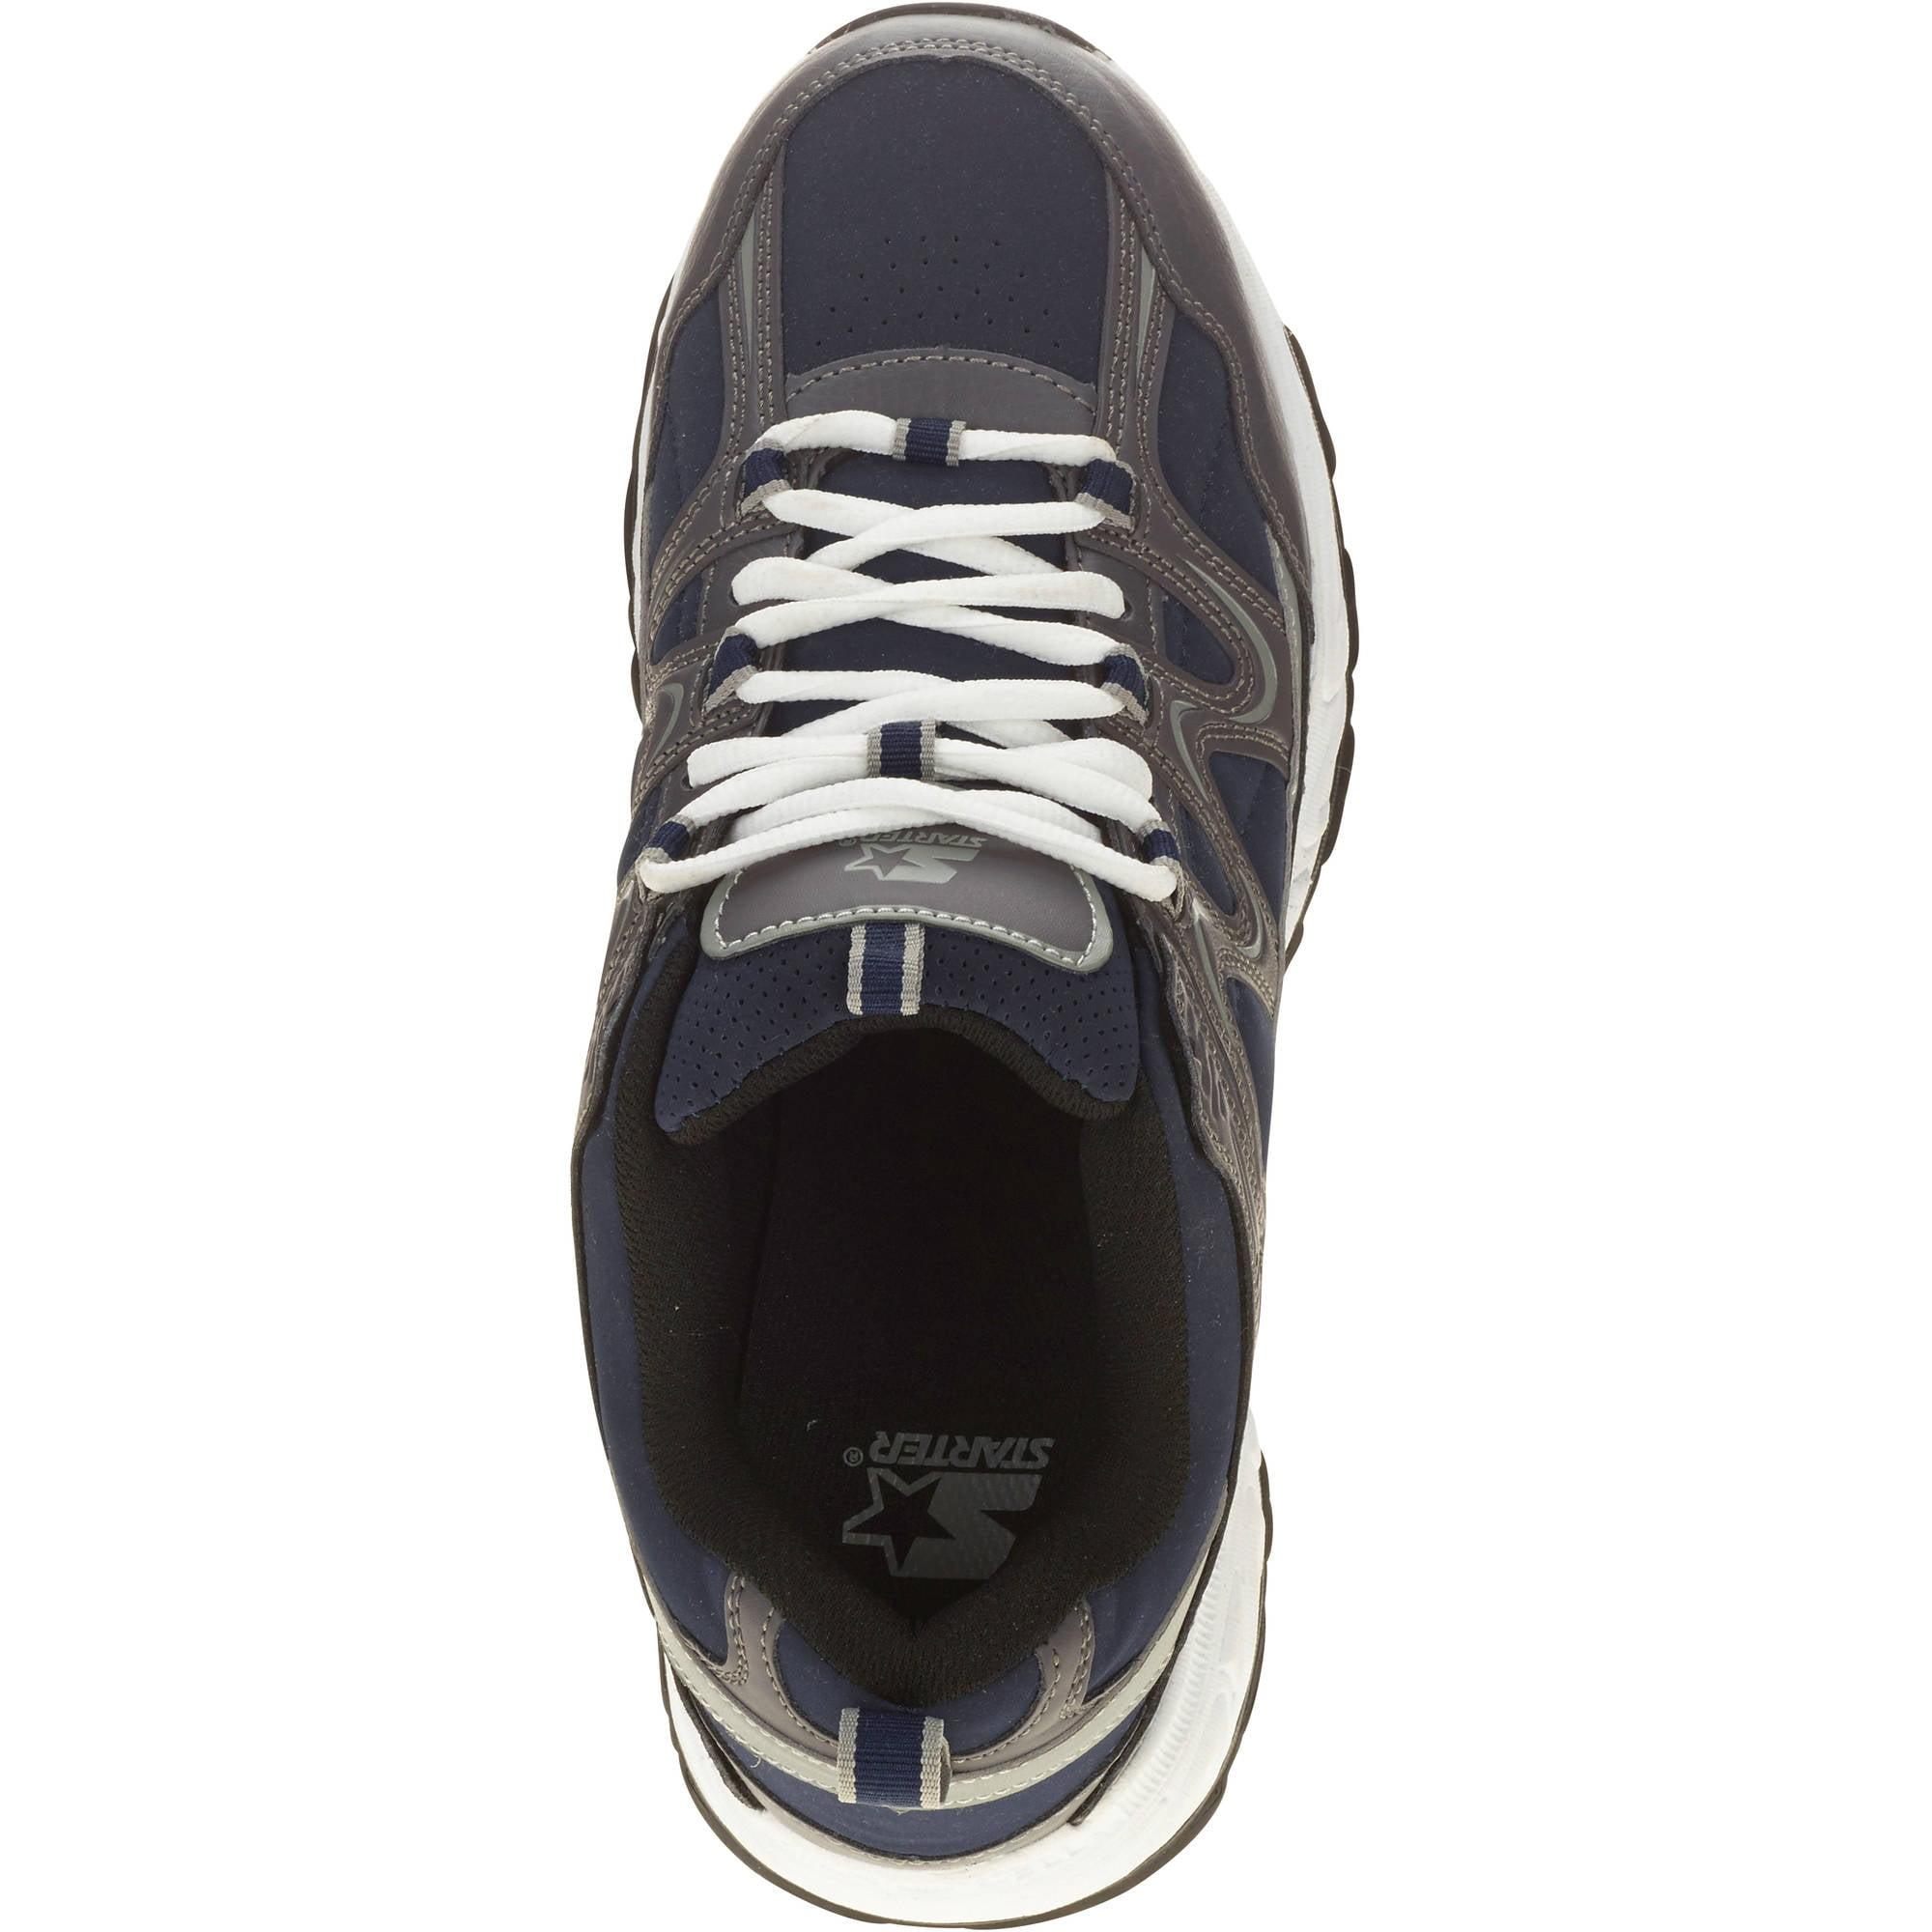 1c20c6349ca25c Starter Foam Memory Men s Wide Width Athletic Shoe - Shoes Fashions